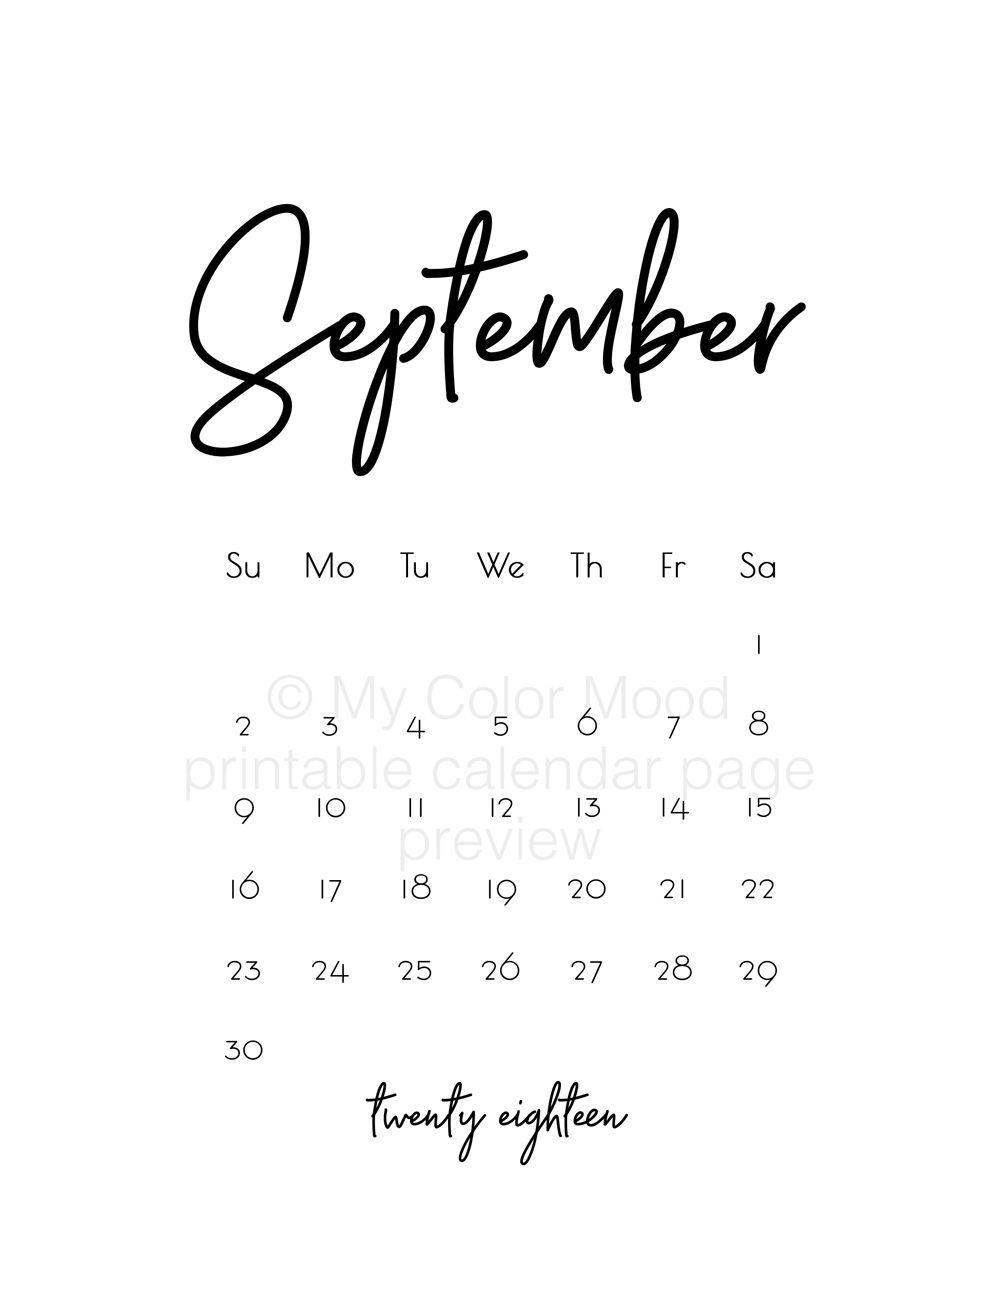 Office calendar 2018, Calendar download, Printable